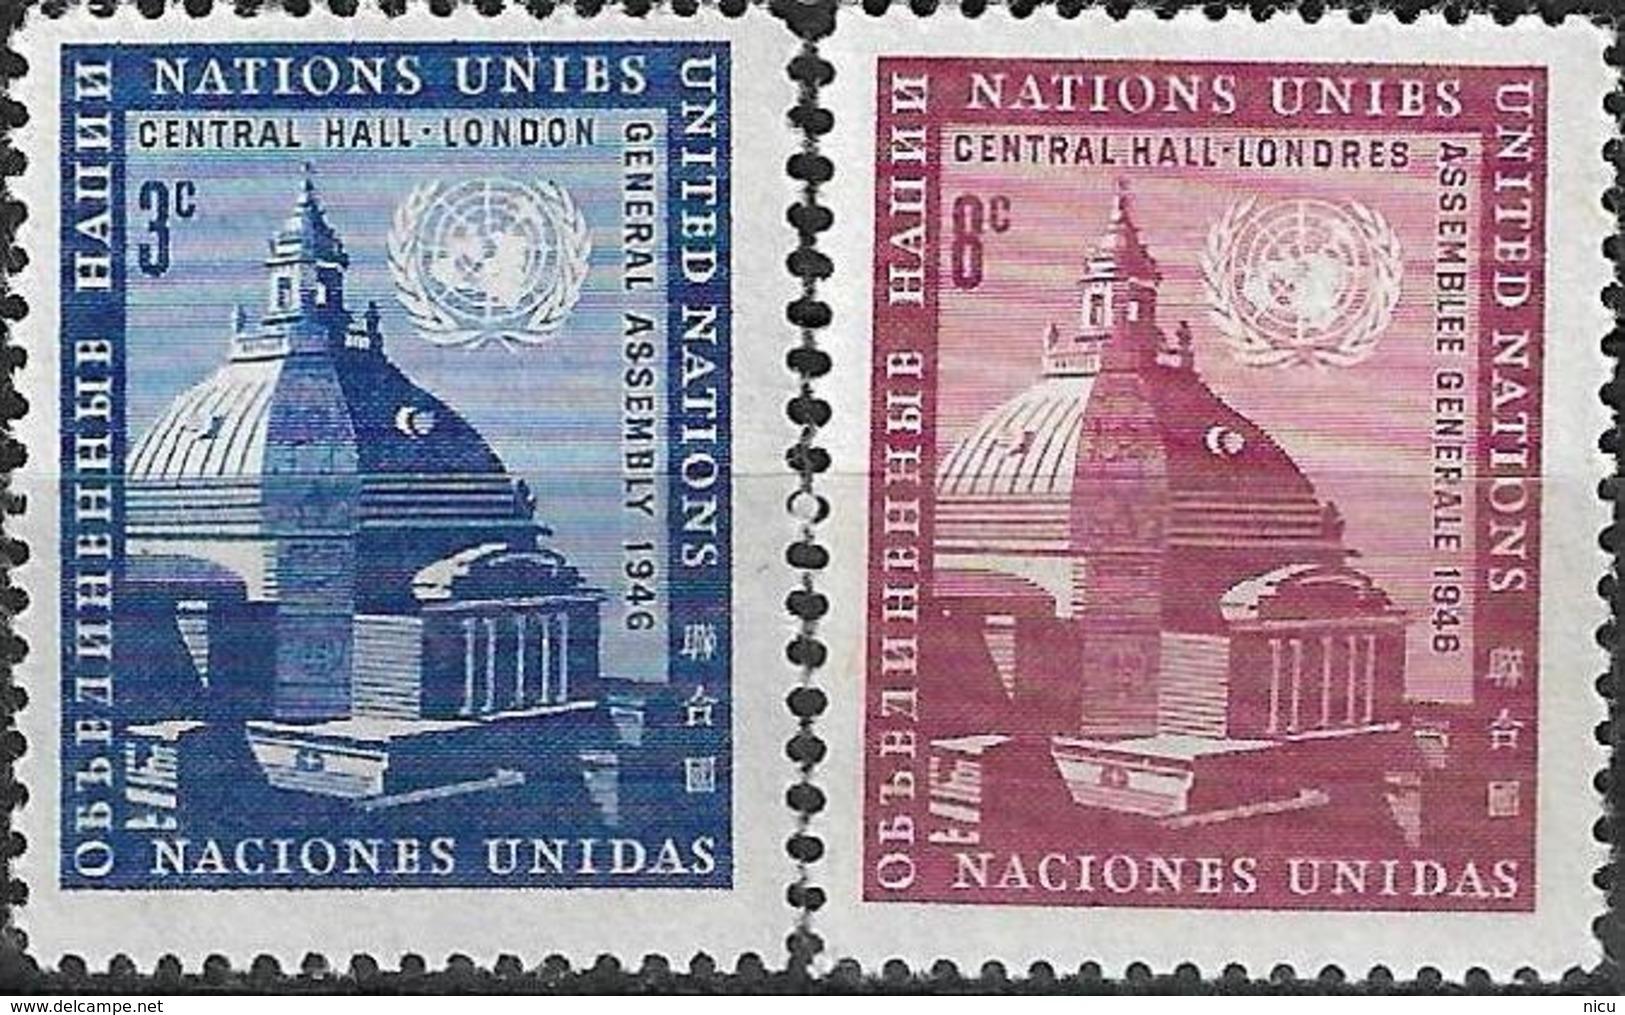 1958 - CENTRAL HALL LONDON - Michel Nr. 68-69 = 0.50 € - New York -  VN Hauptquartier